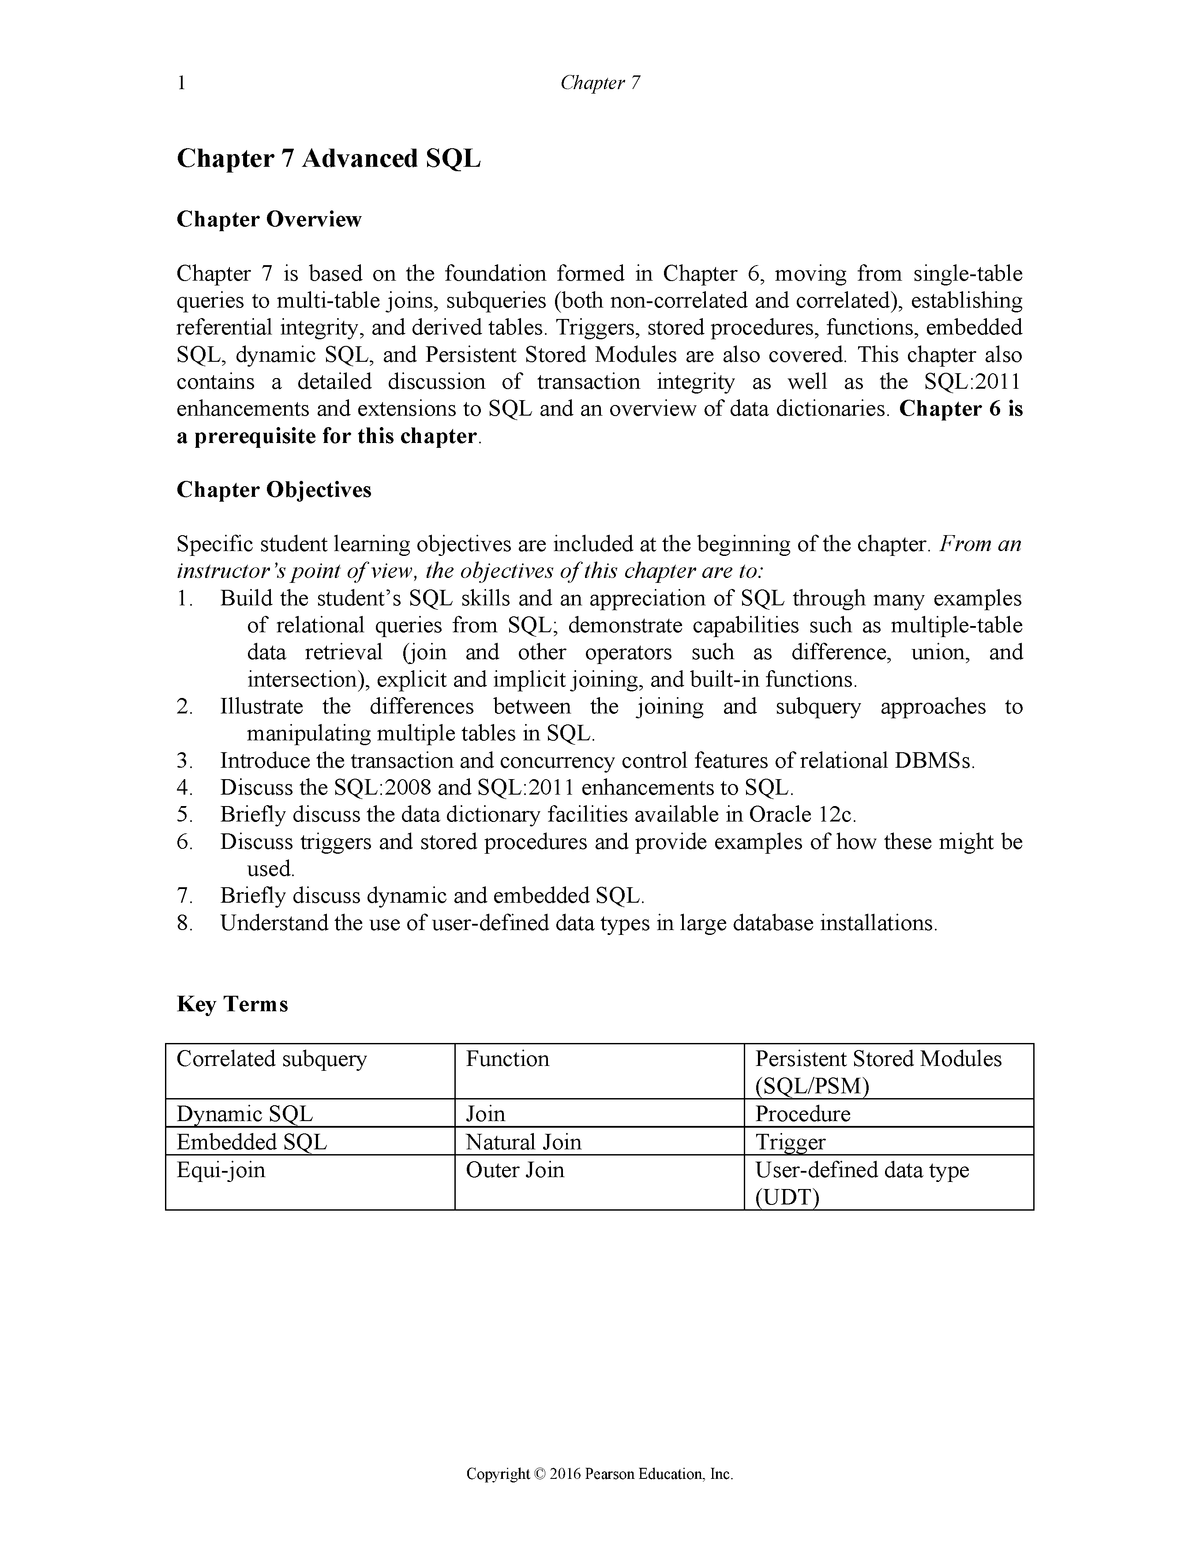 Hoffer mdm12 IM 07 - Solution manual Modern Database